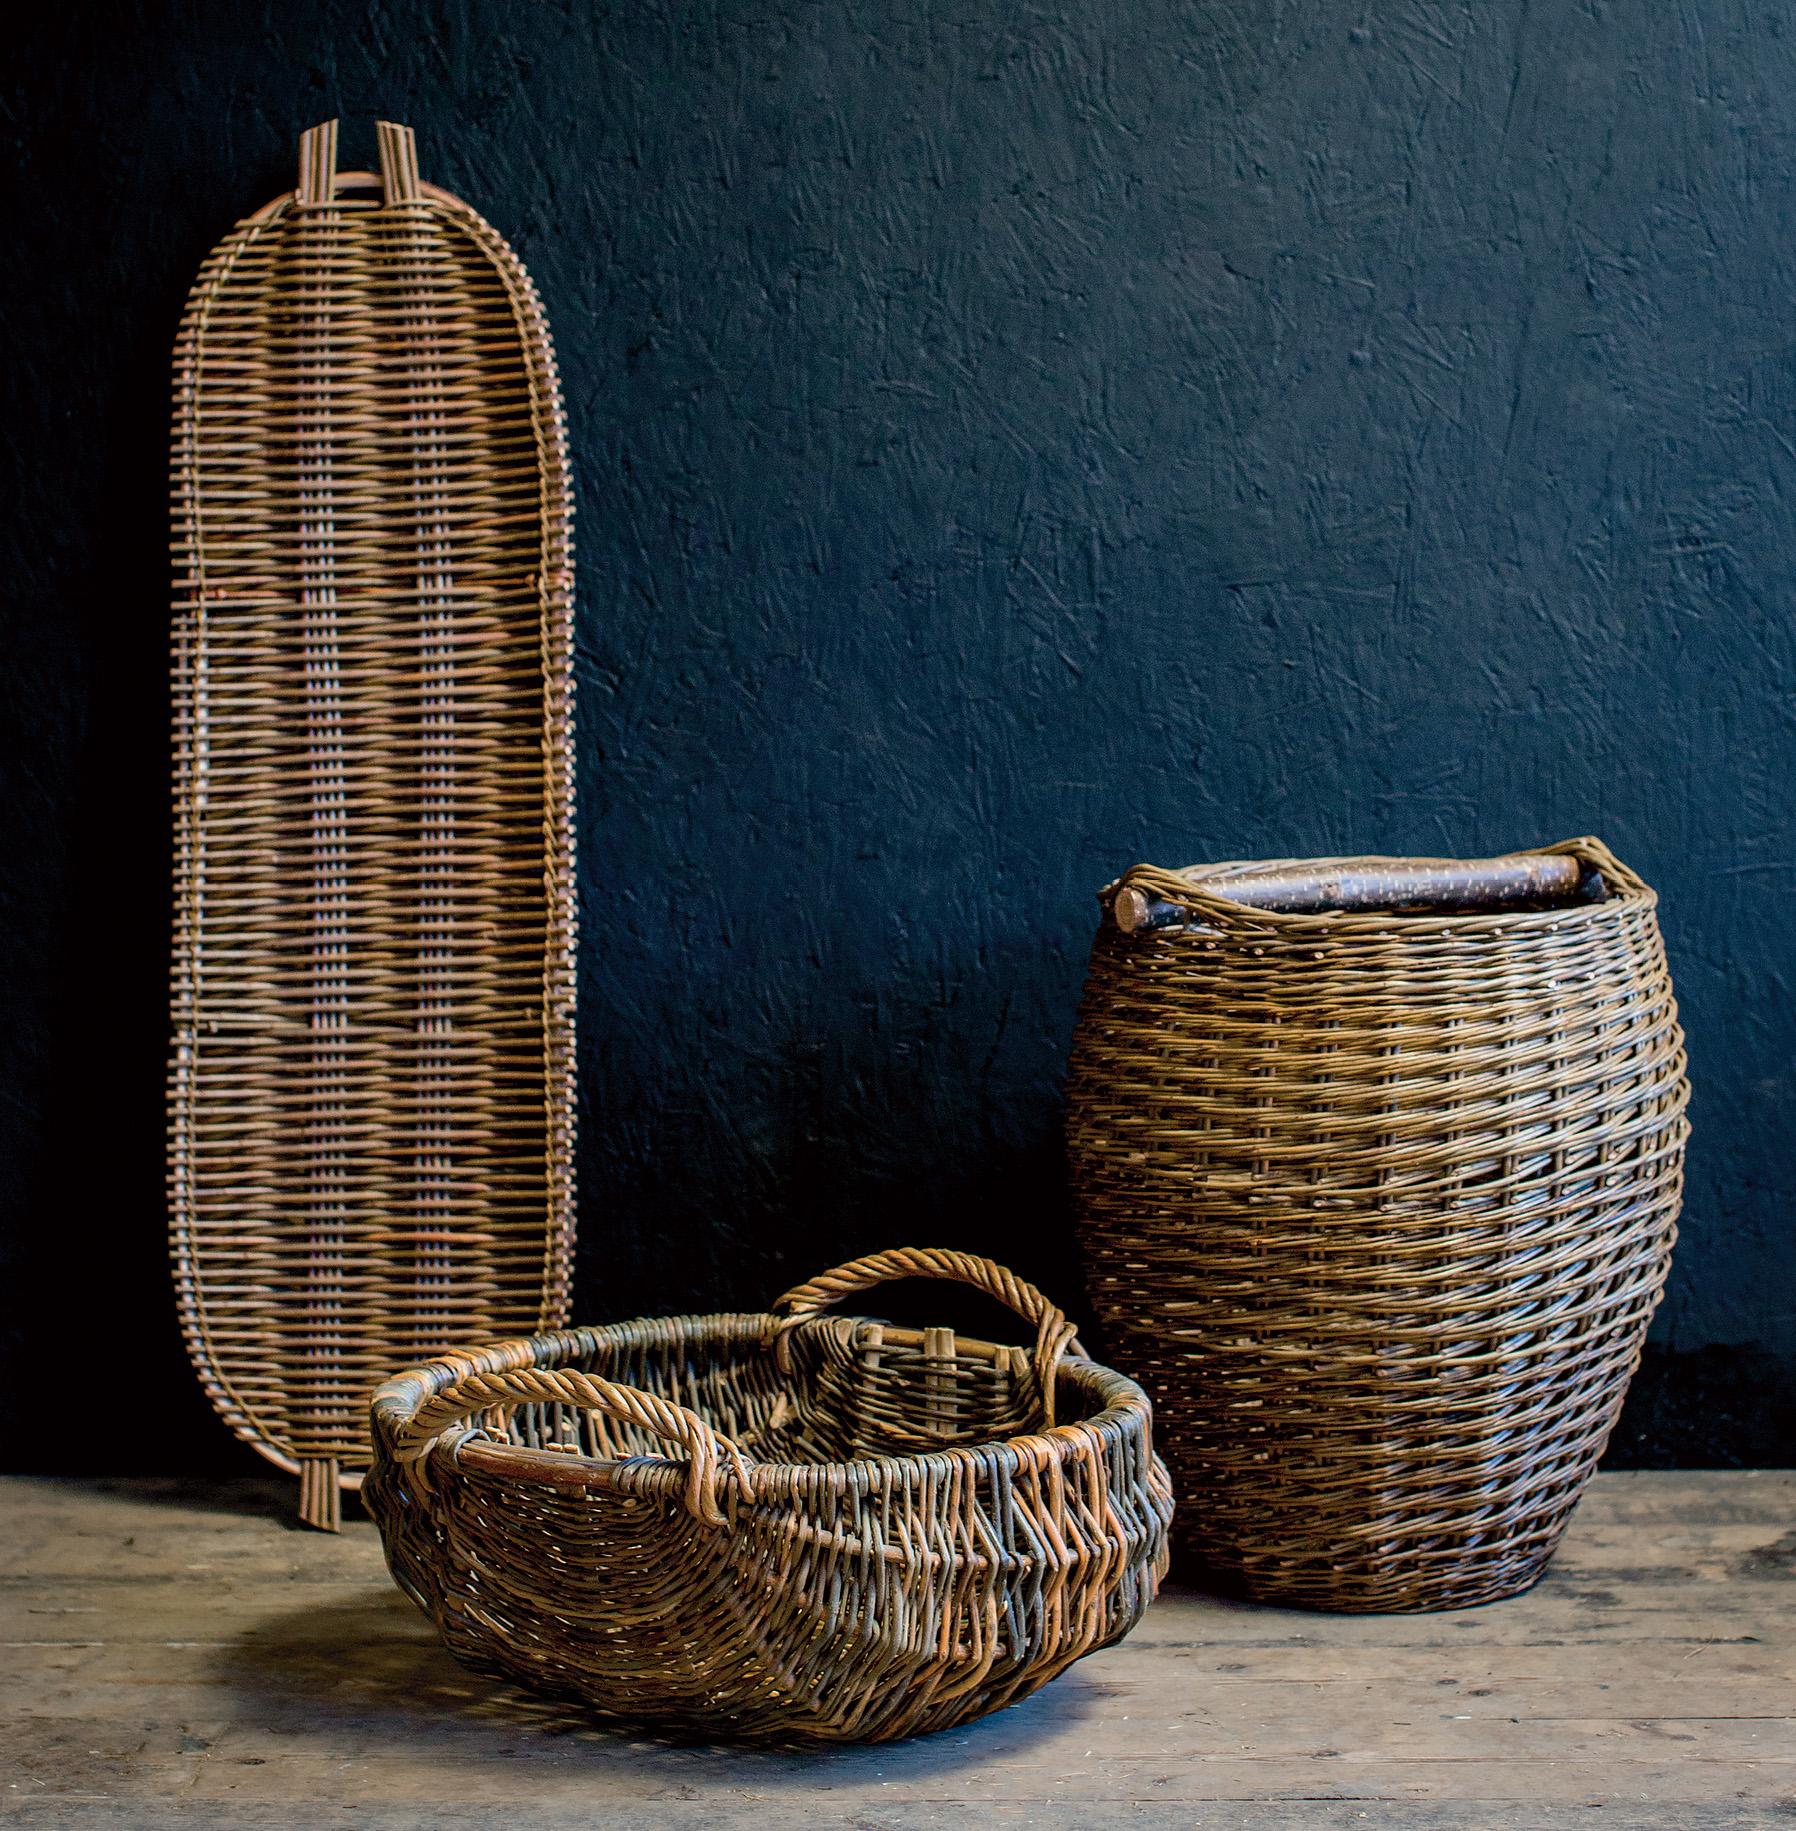 3 baskets.jpg